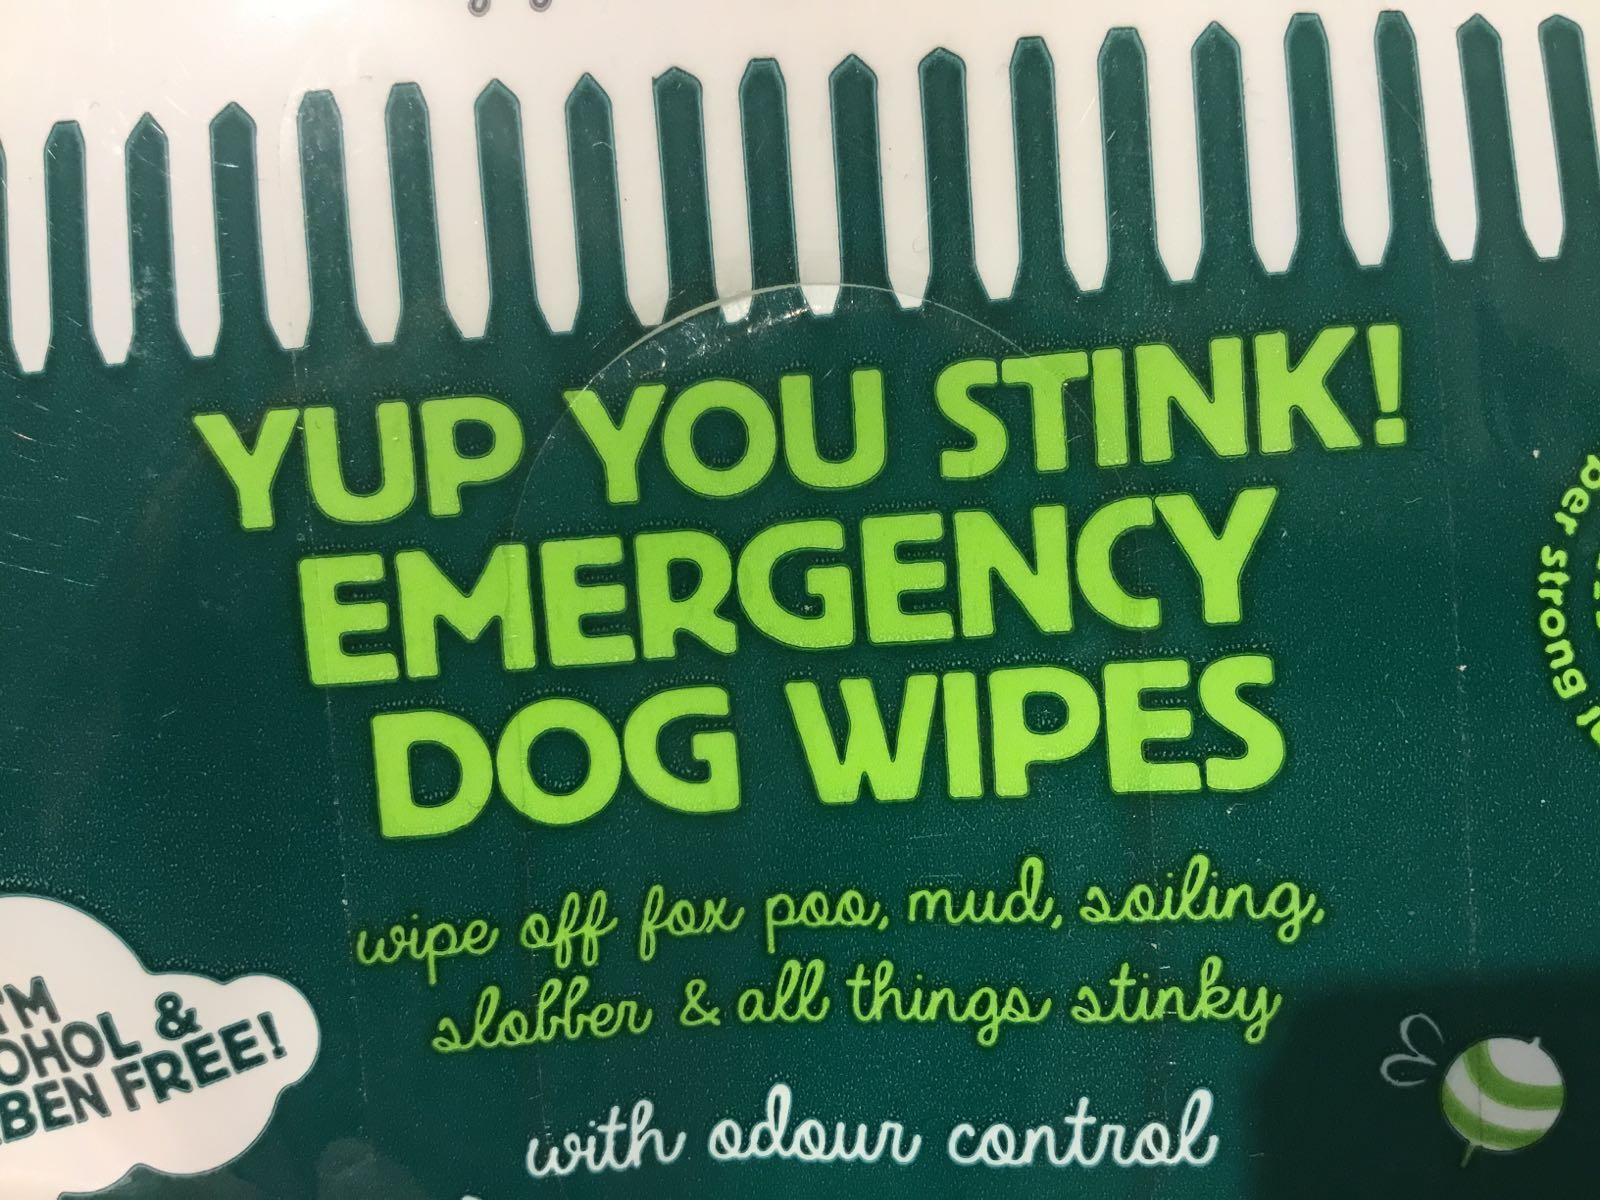 Yup you stink emergency dog wipes